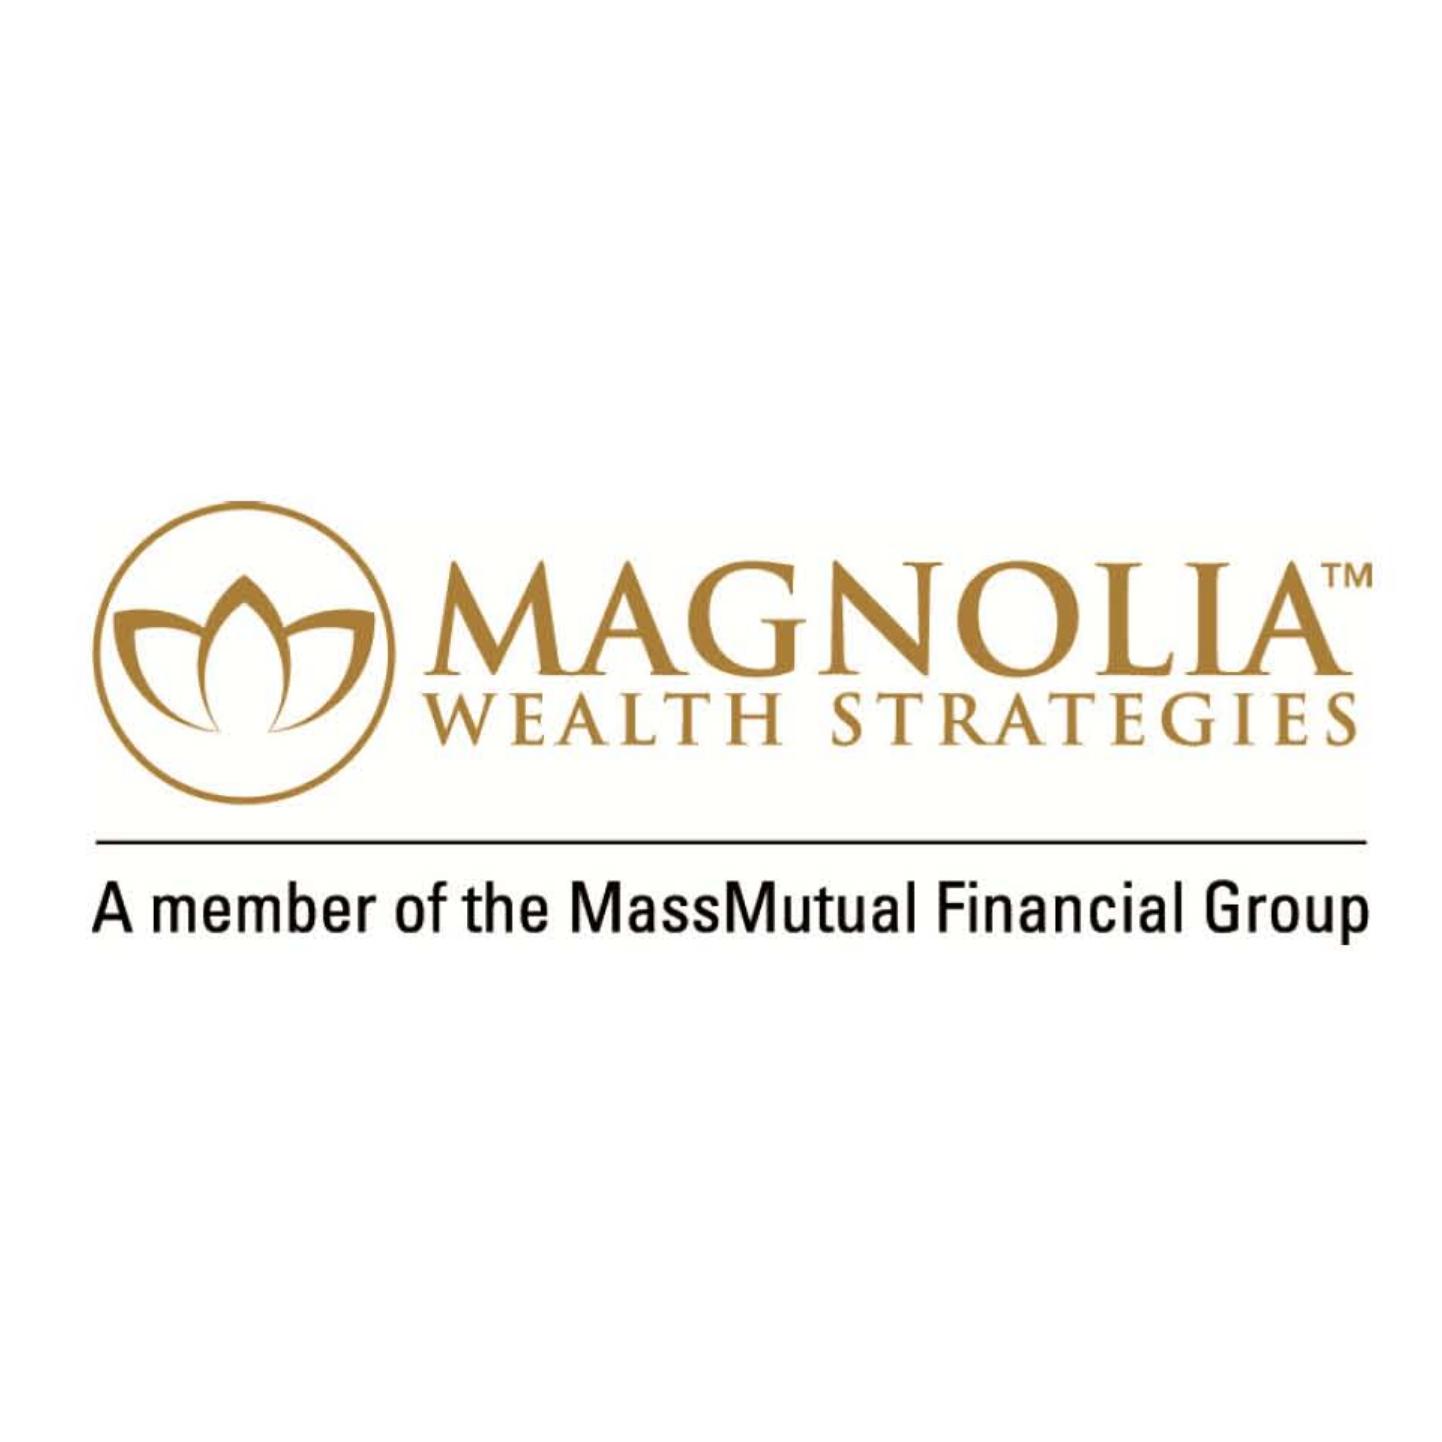 Magnolia Wealth Strategies